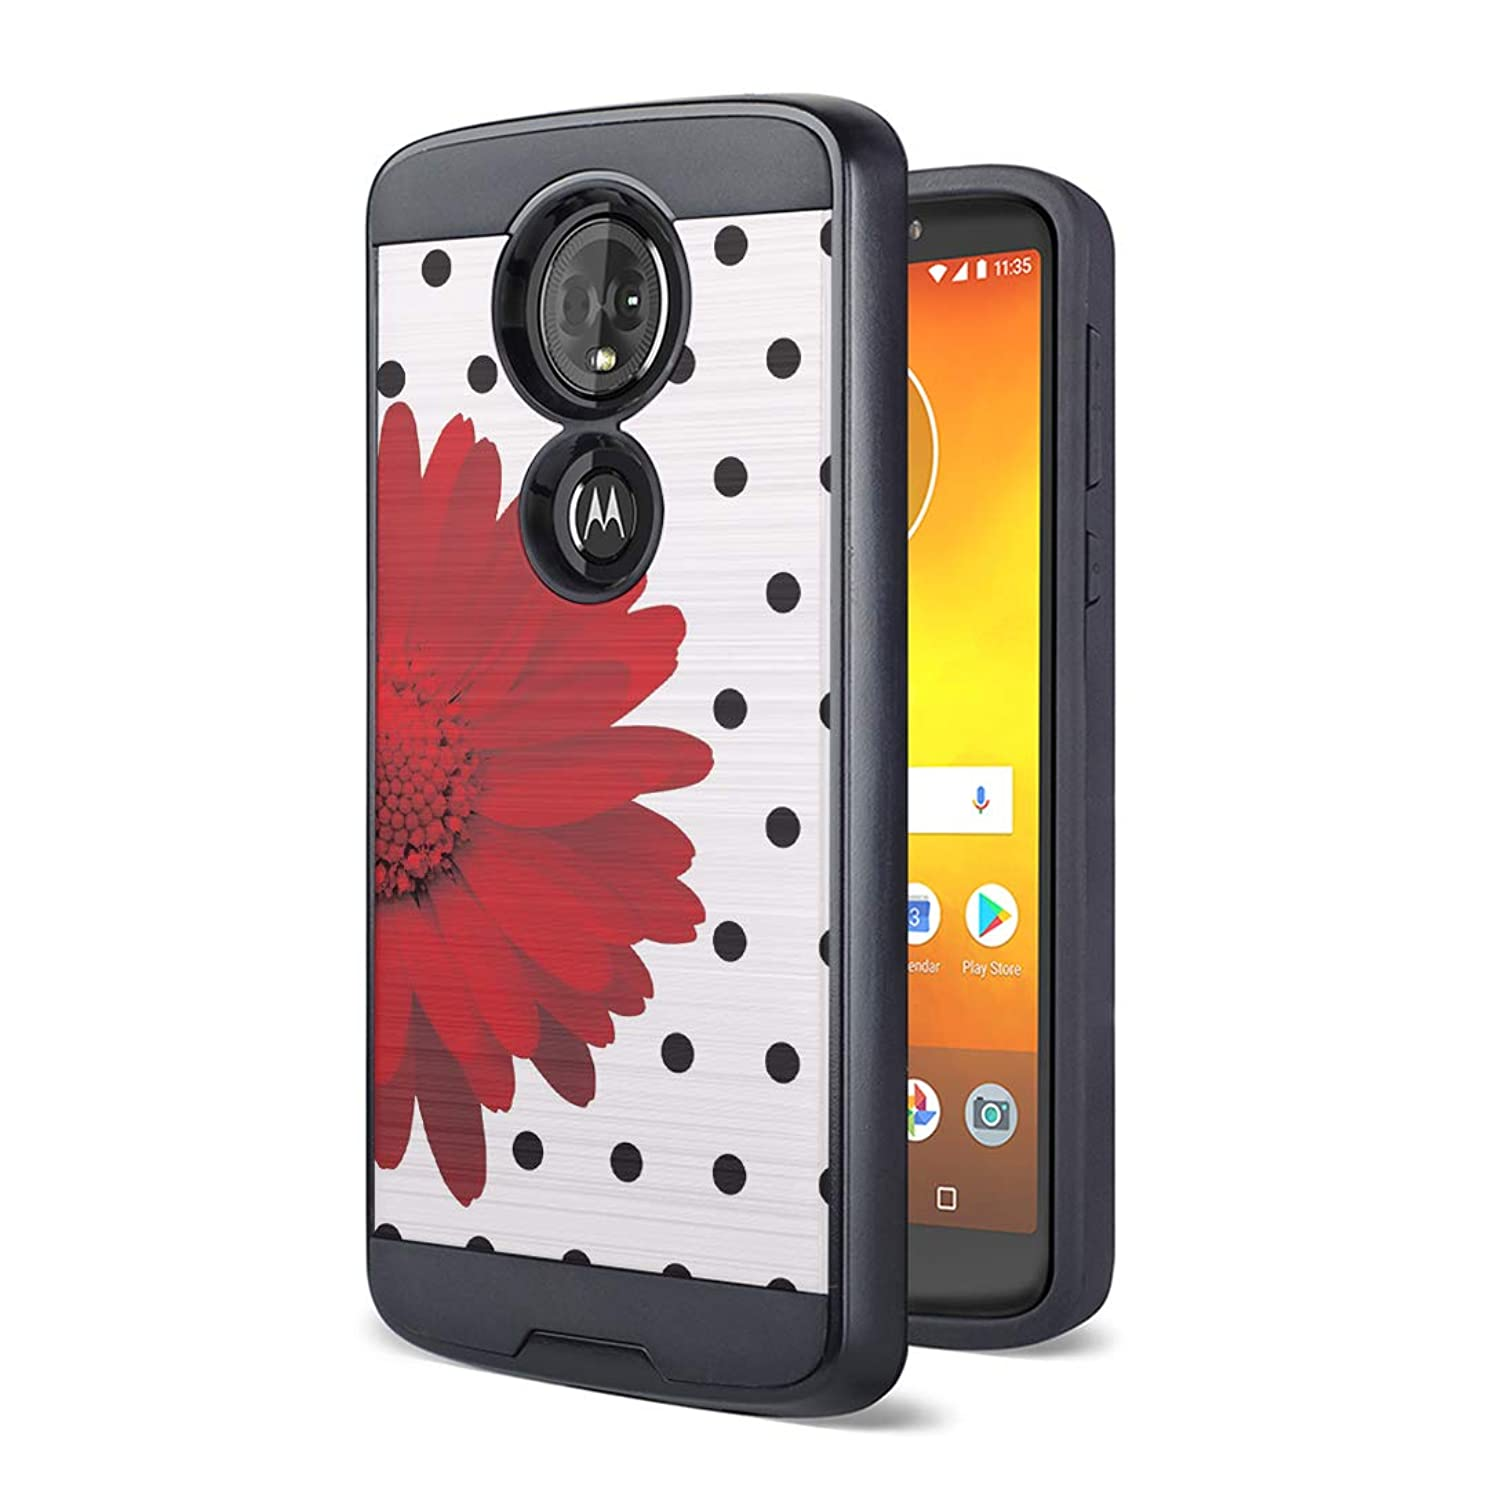 Moriko Case Compatible with Moto G7 Power, Moto G7 Supra [Drop Protection Fusion Dual Layer Slick Armor Case Black] for Motorola Moto G7 Power - (Red Daisy)